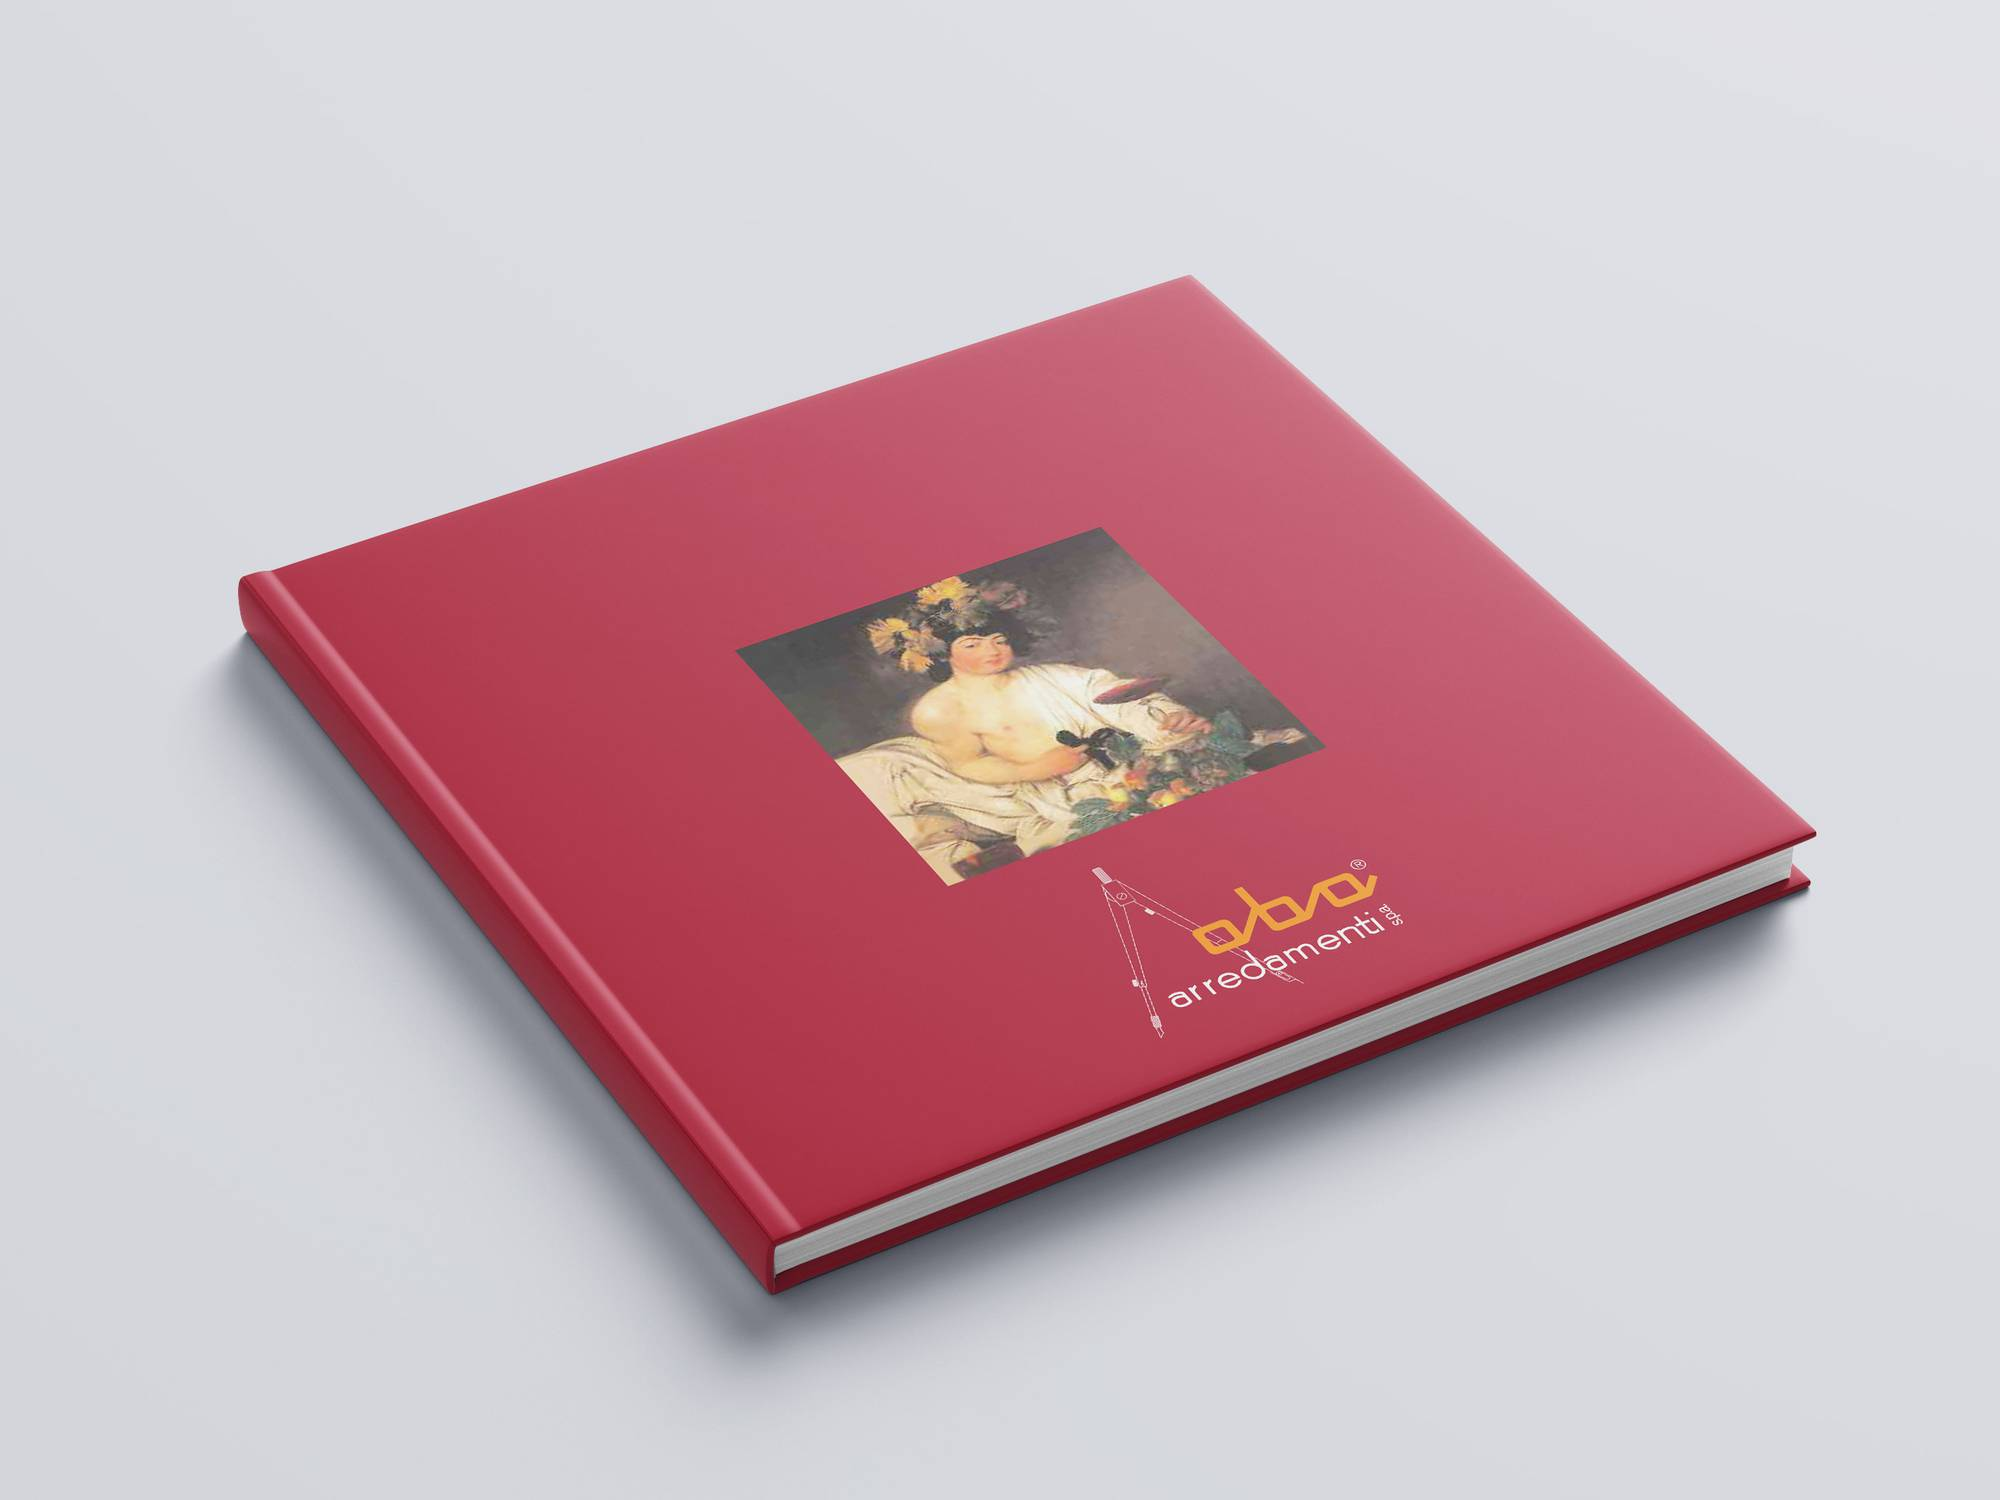 Book-ed-5.jpg